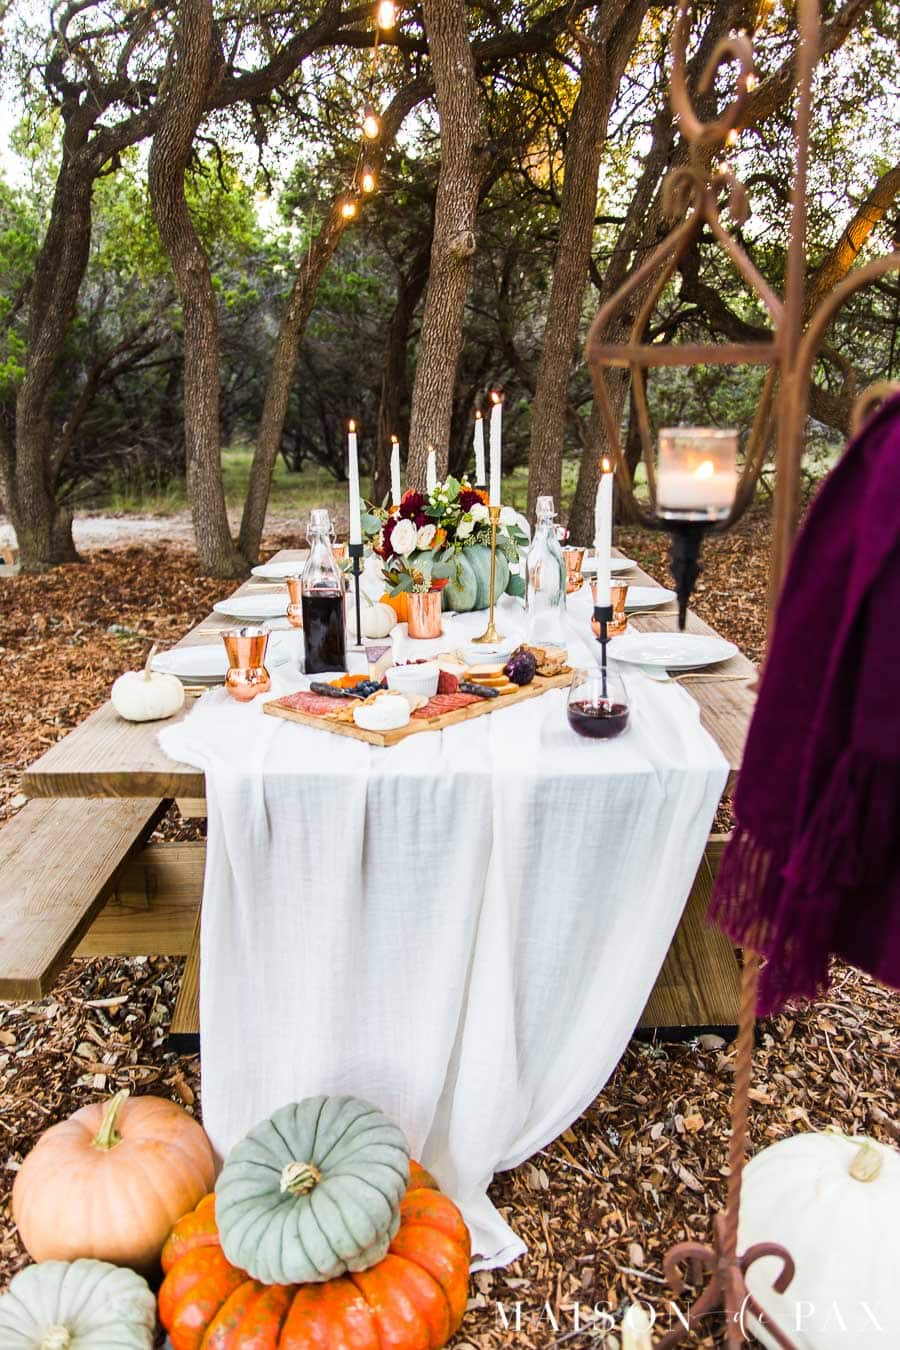 charcuterie board for fall table outdoor friendsgiving | Maison de Pax